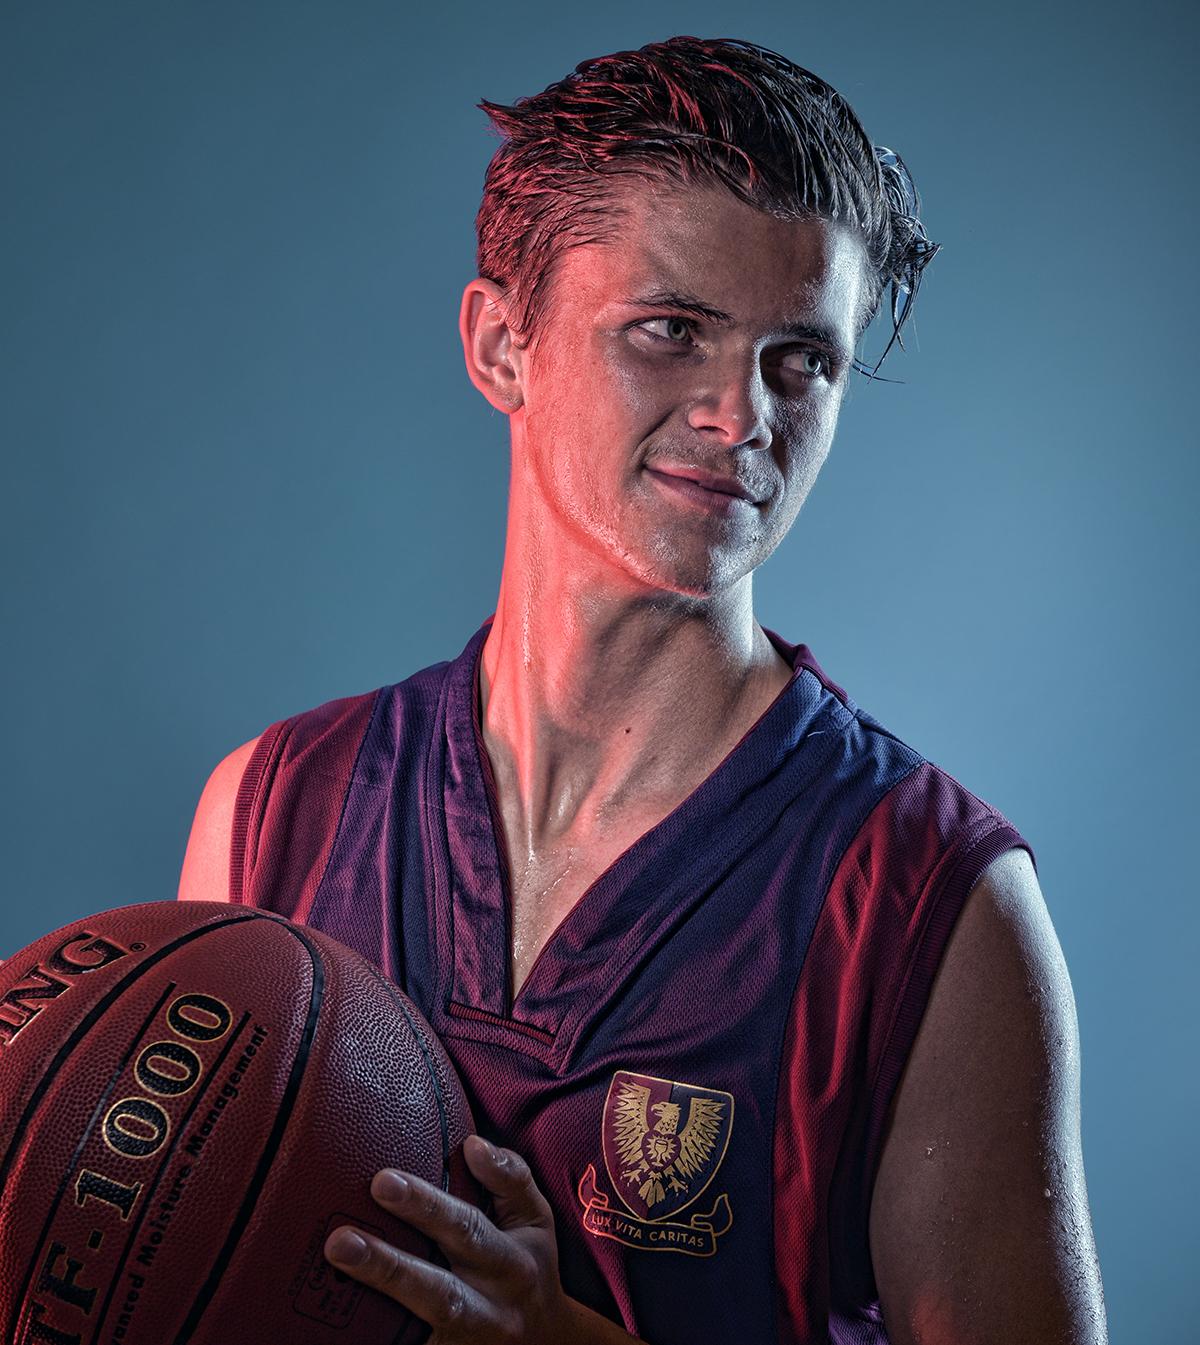 brandon-barnard-photography-corporate-sport-portrait-photography-st-johns-basketball-tournament-front.jpg